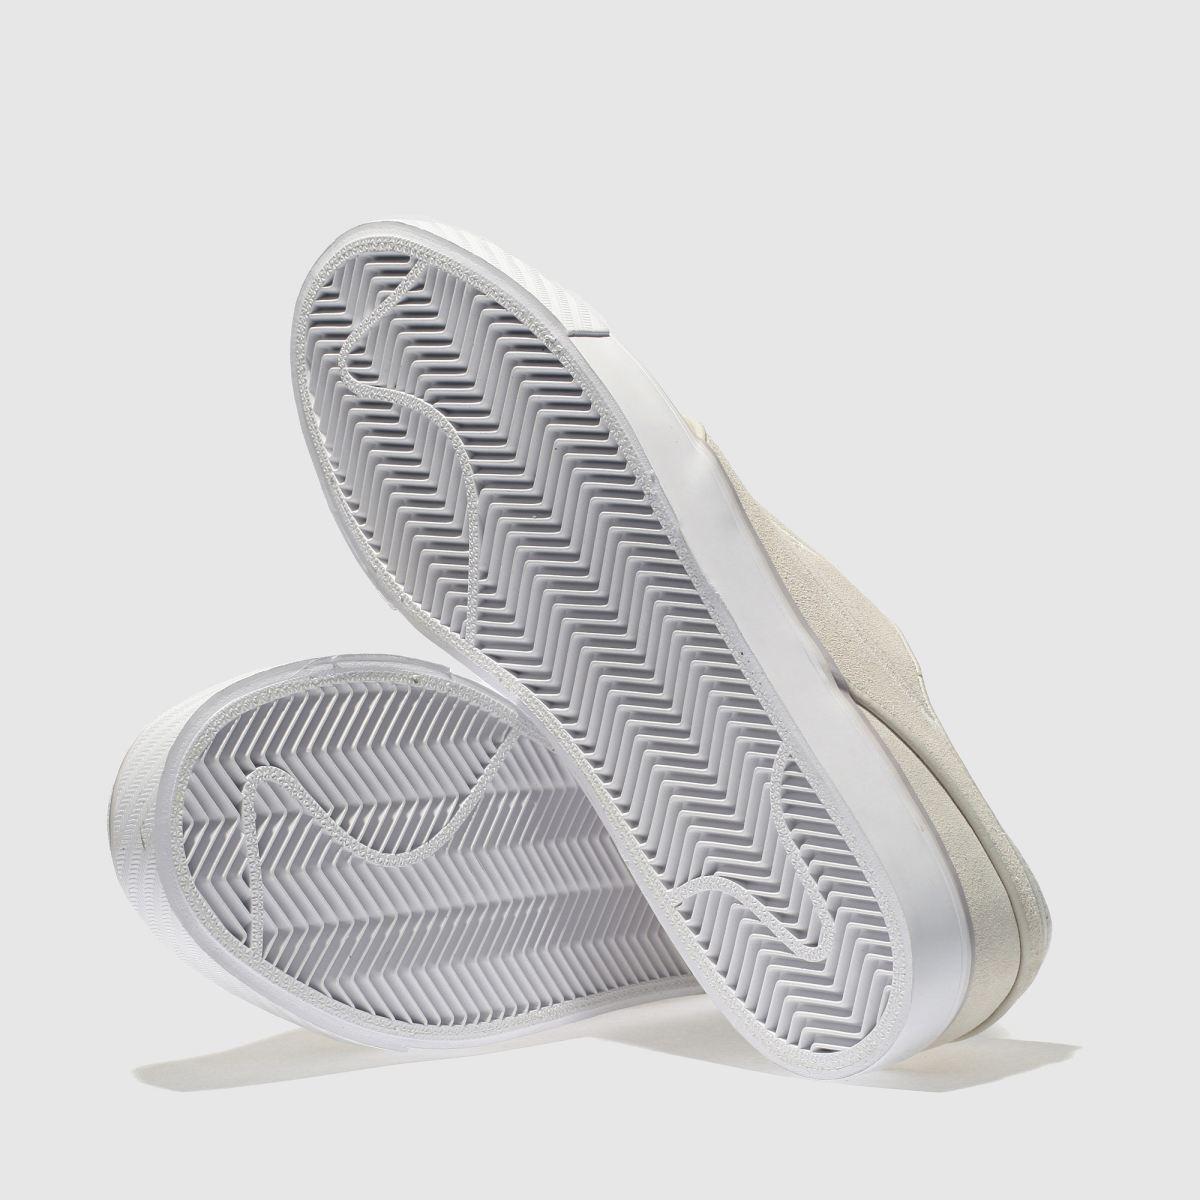 Damen schuh Naturfarben nike sb Stefan Janoski Sneaker   schuh Damen Gute Qualität beliebte Schuhe 2229dd